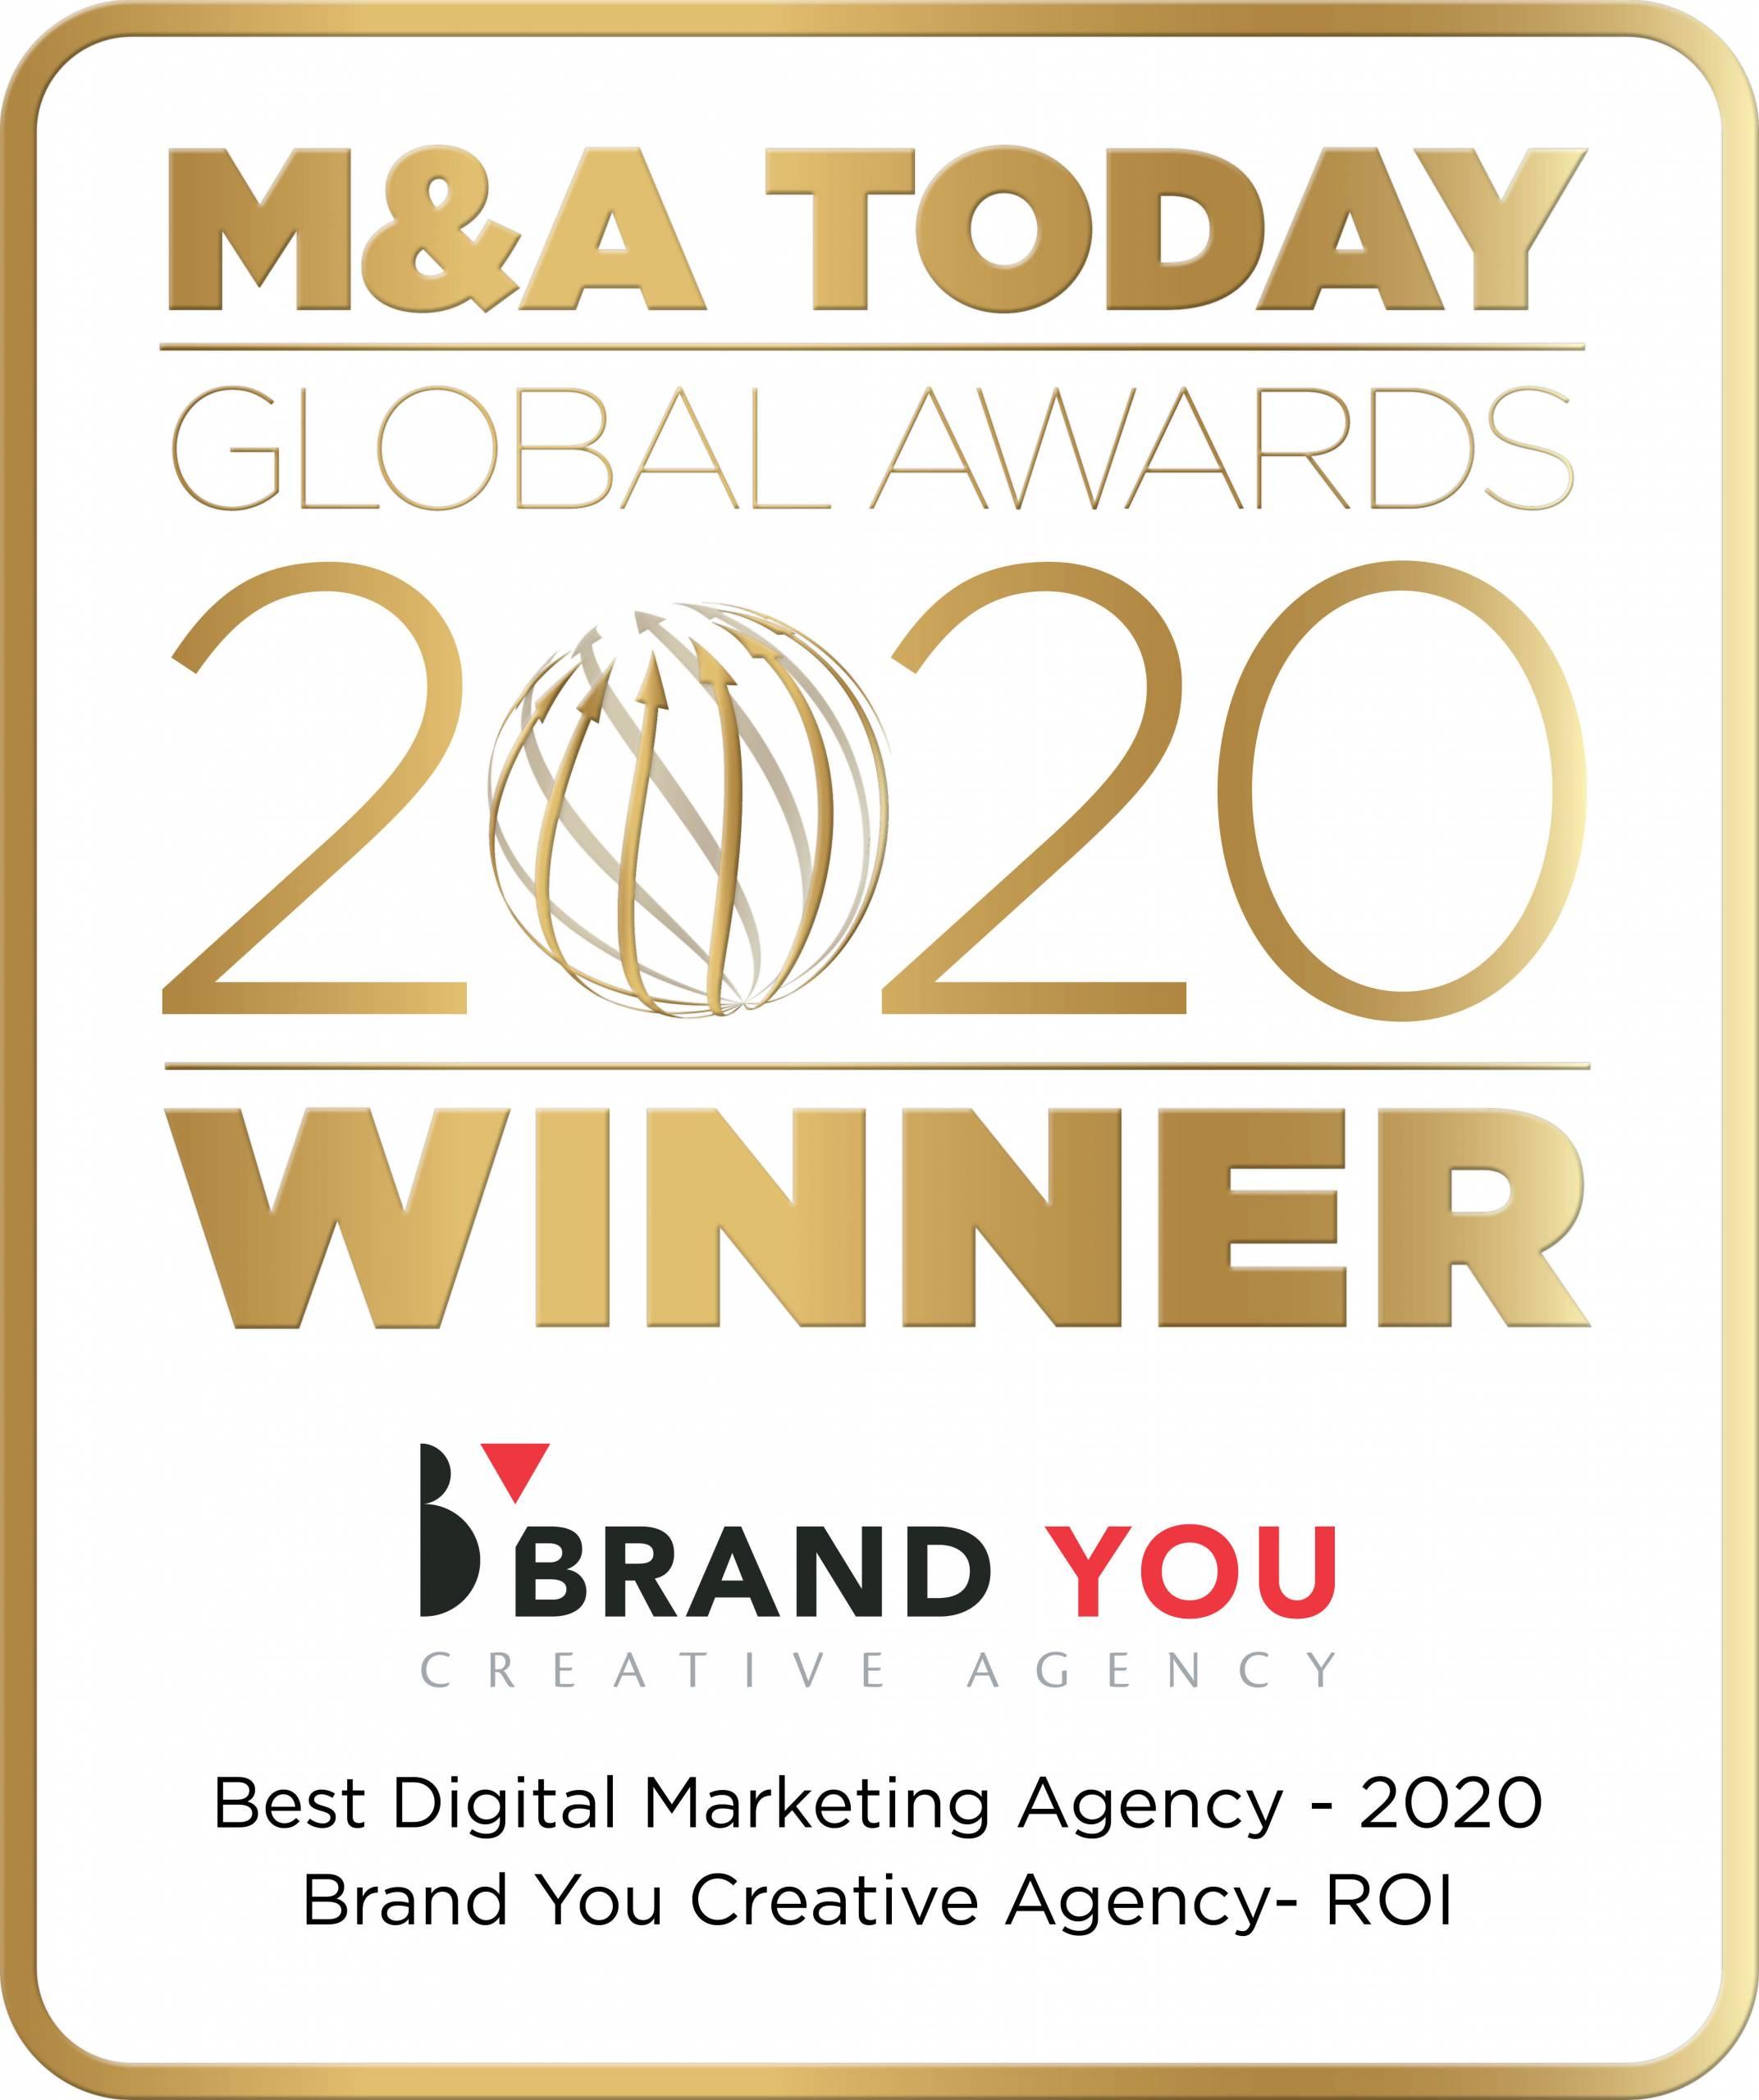 MA-Today-Global-Awards-logo-2020_Brand-You-Creative-Agency